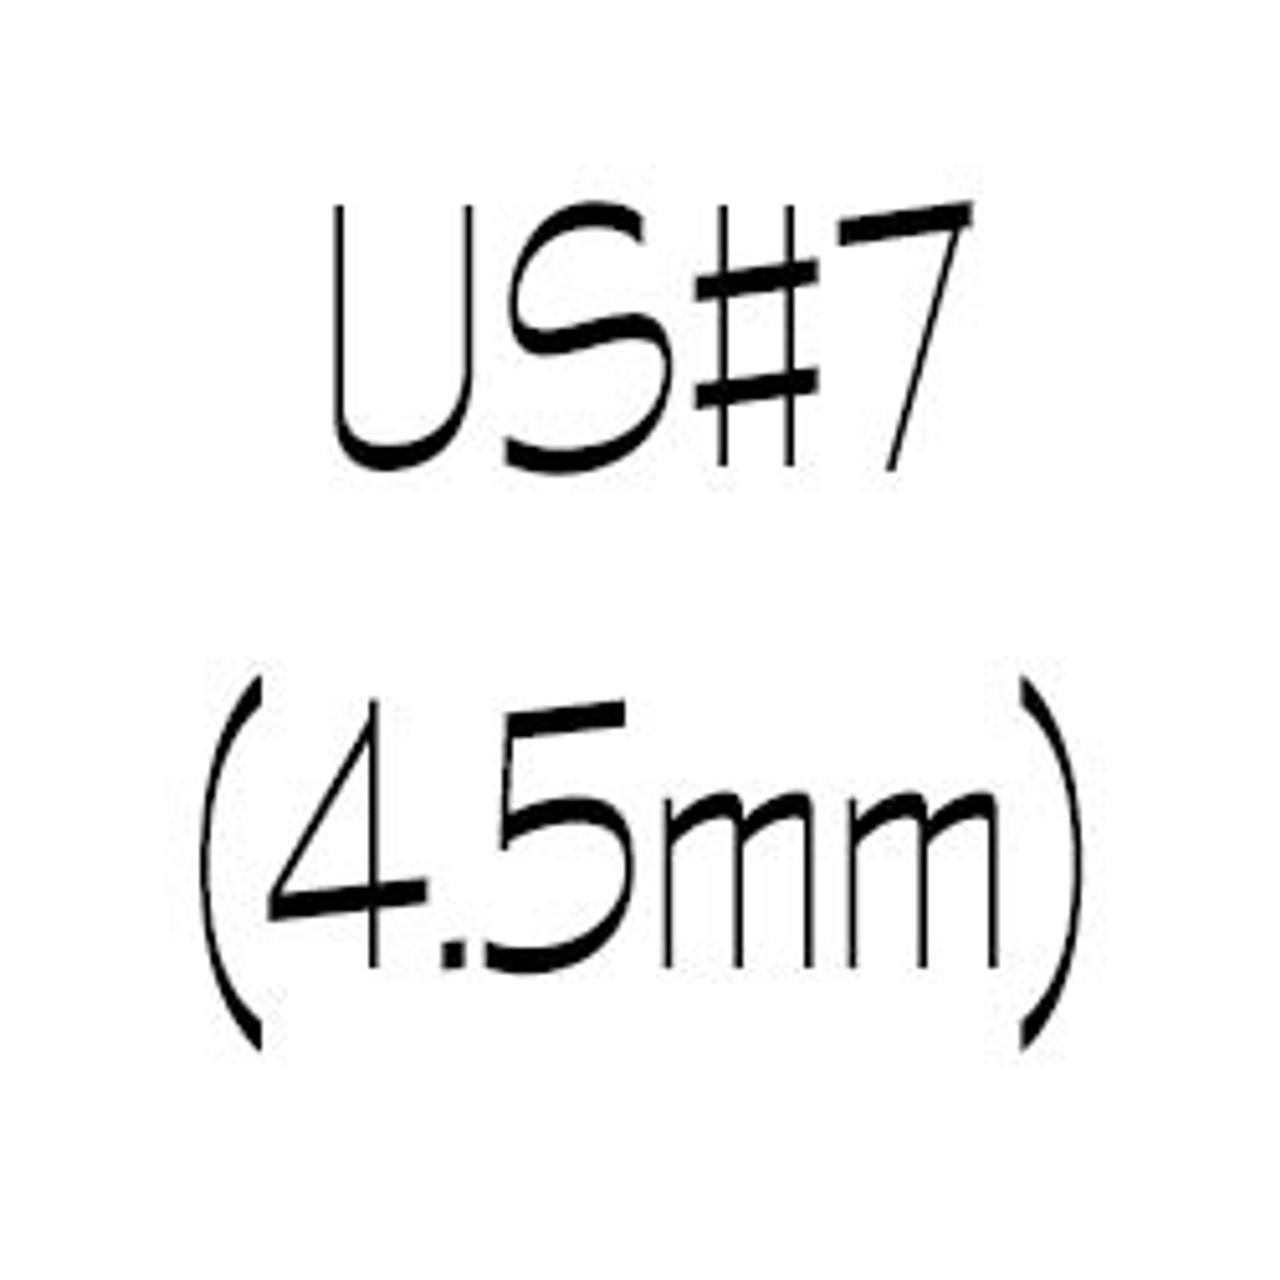 US#7 (4.5mm) circular knitting needles